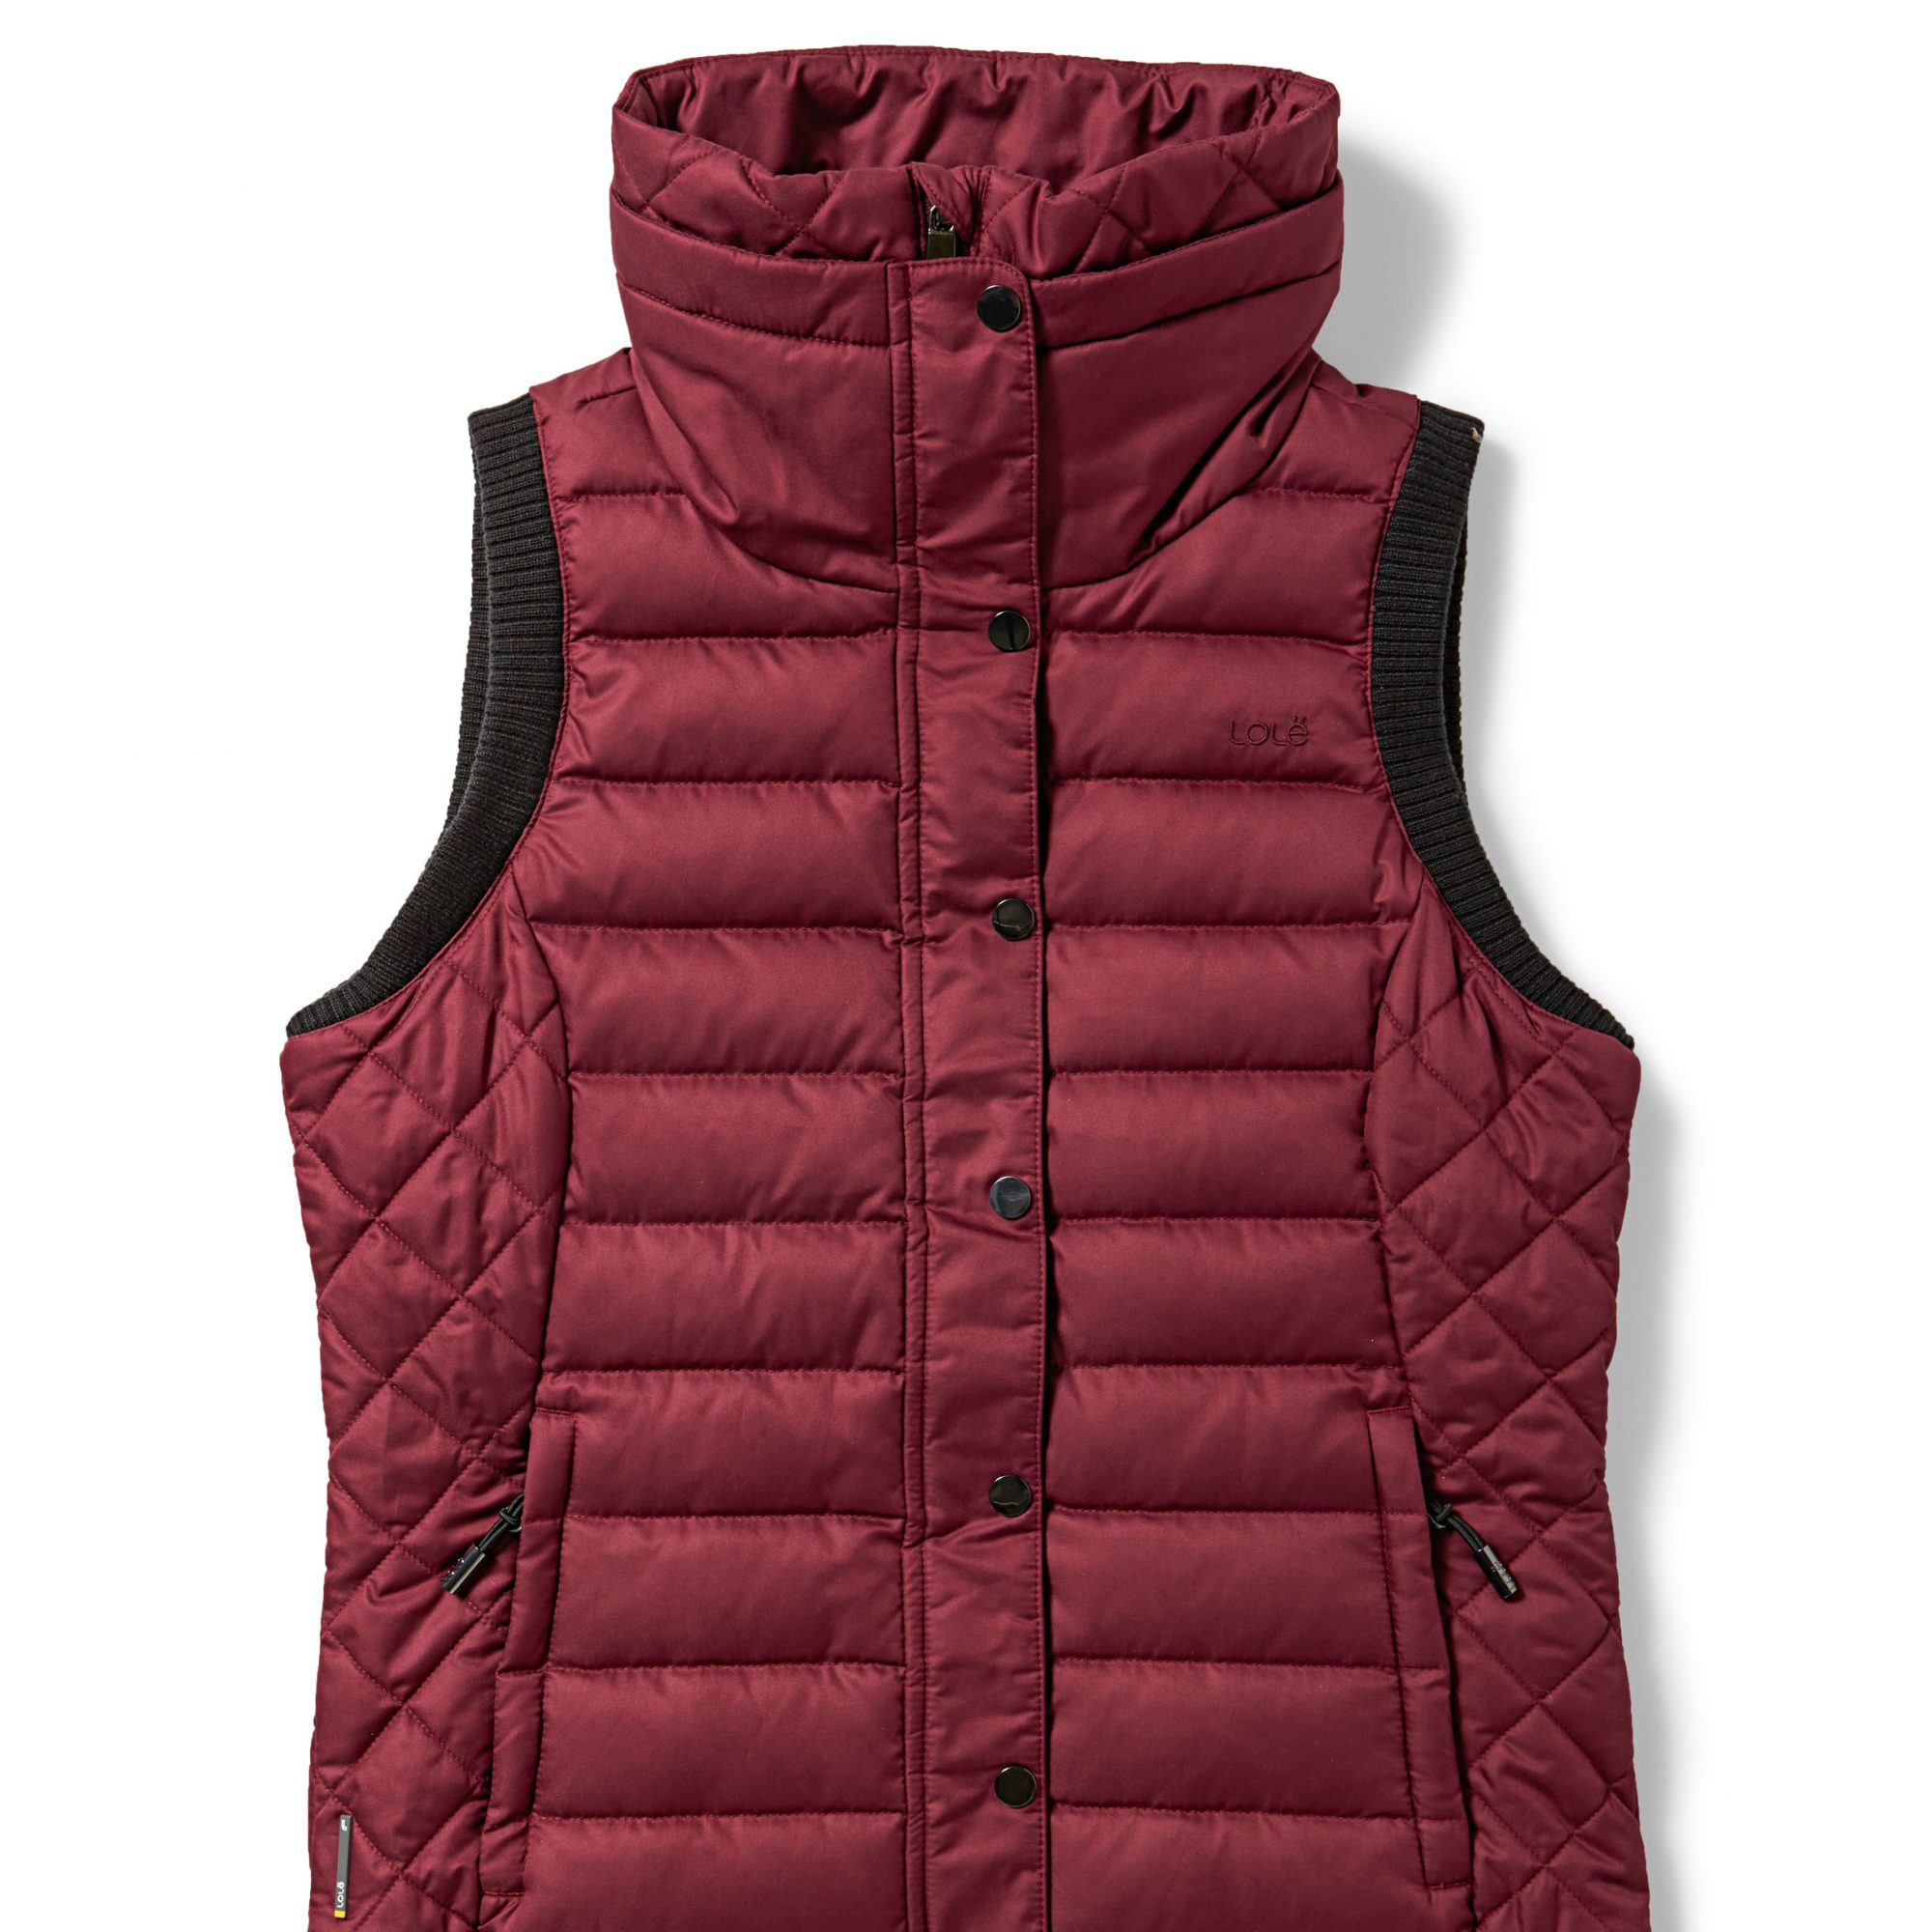 brooklyn superlight vest by lole